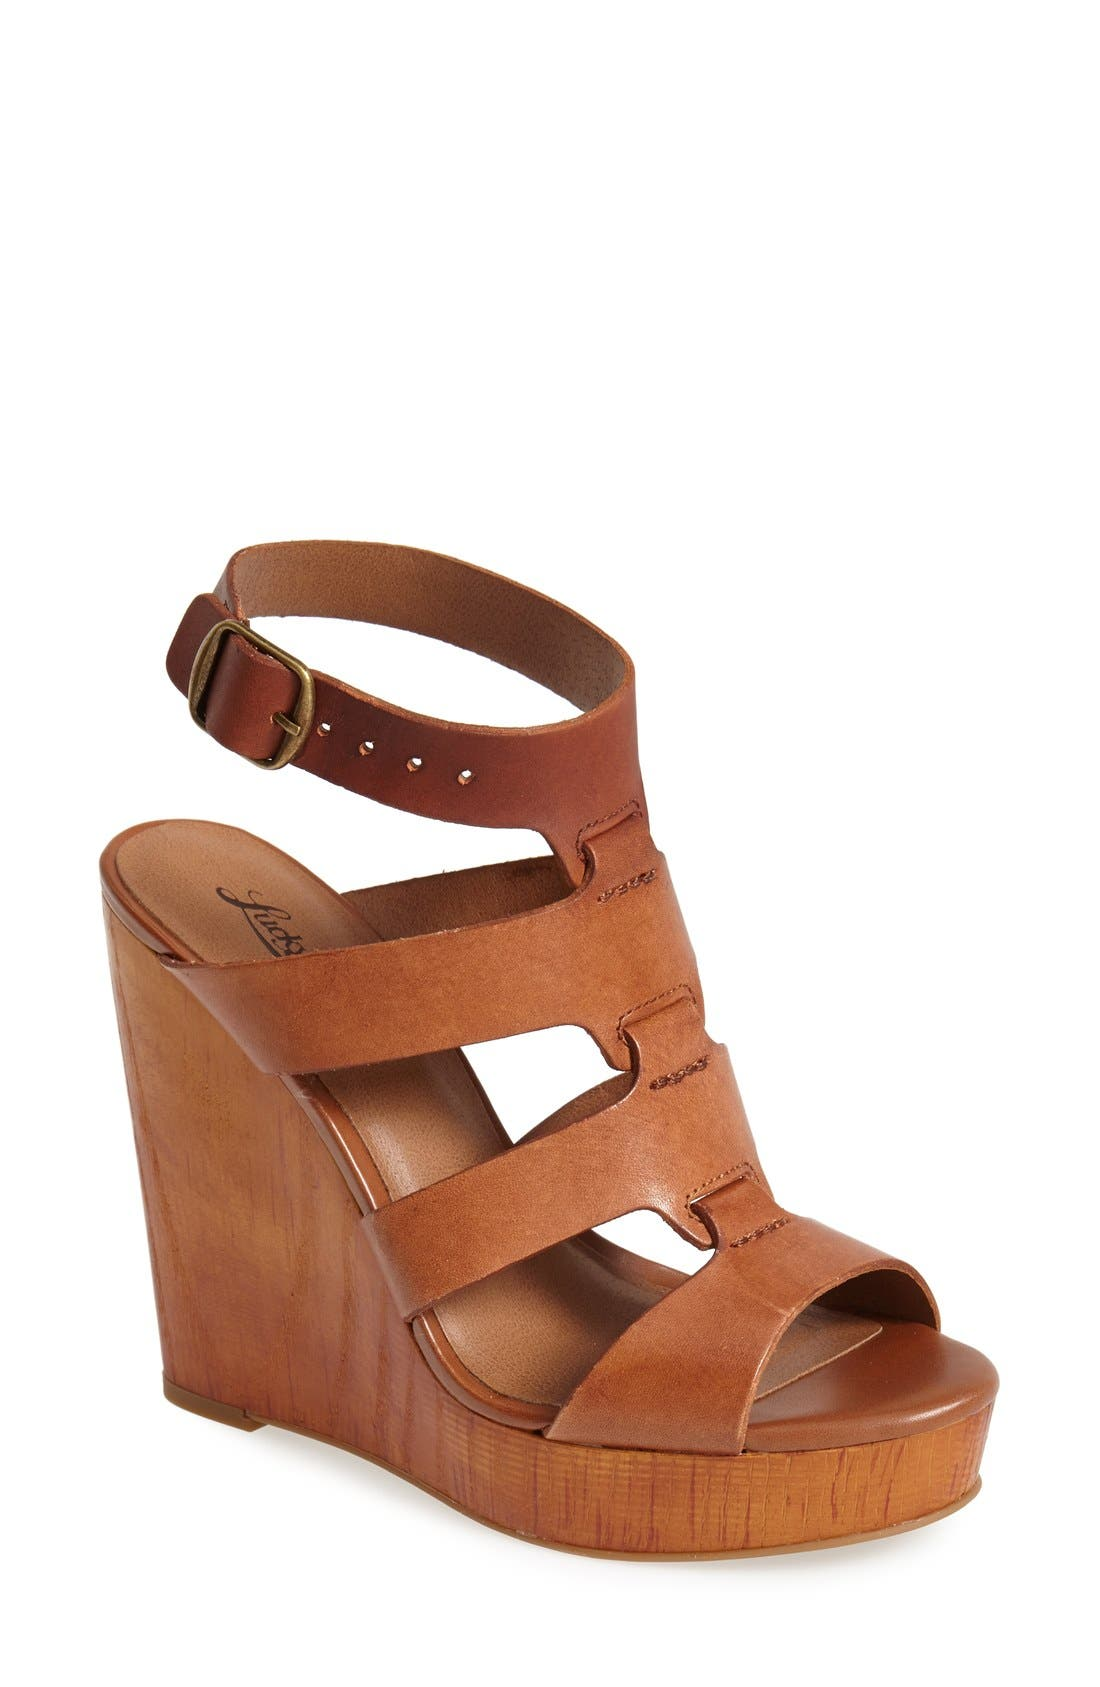 Alternate Image 1 Selected - Lucky Brand 'Roselyn' Leather Caged Platform Sandal (Women)